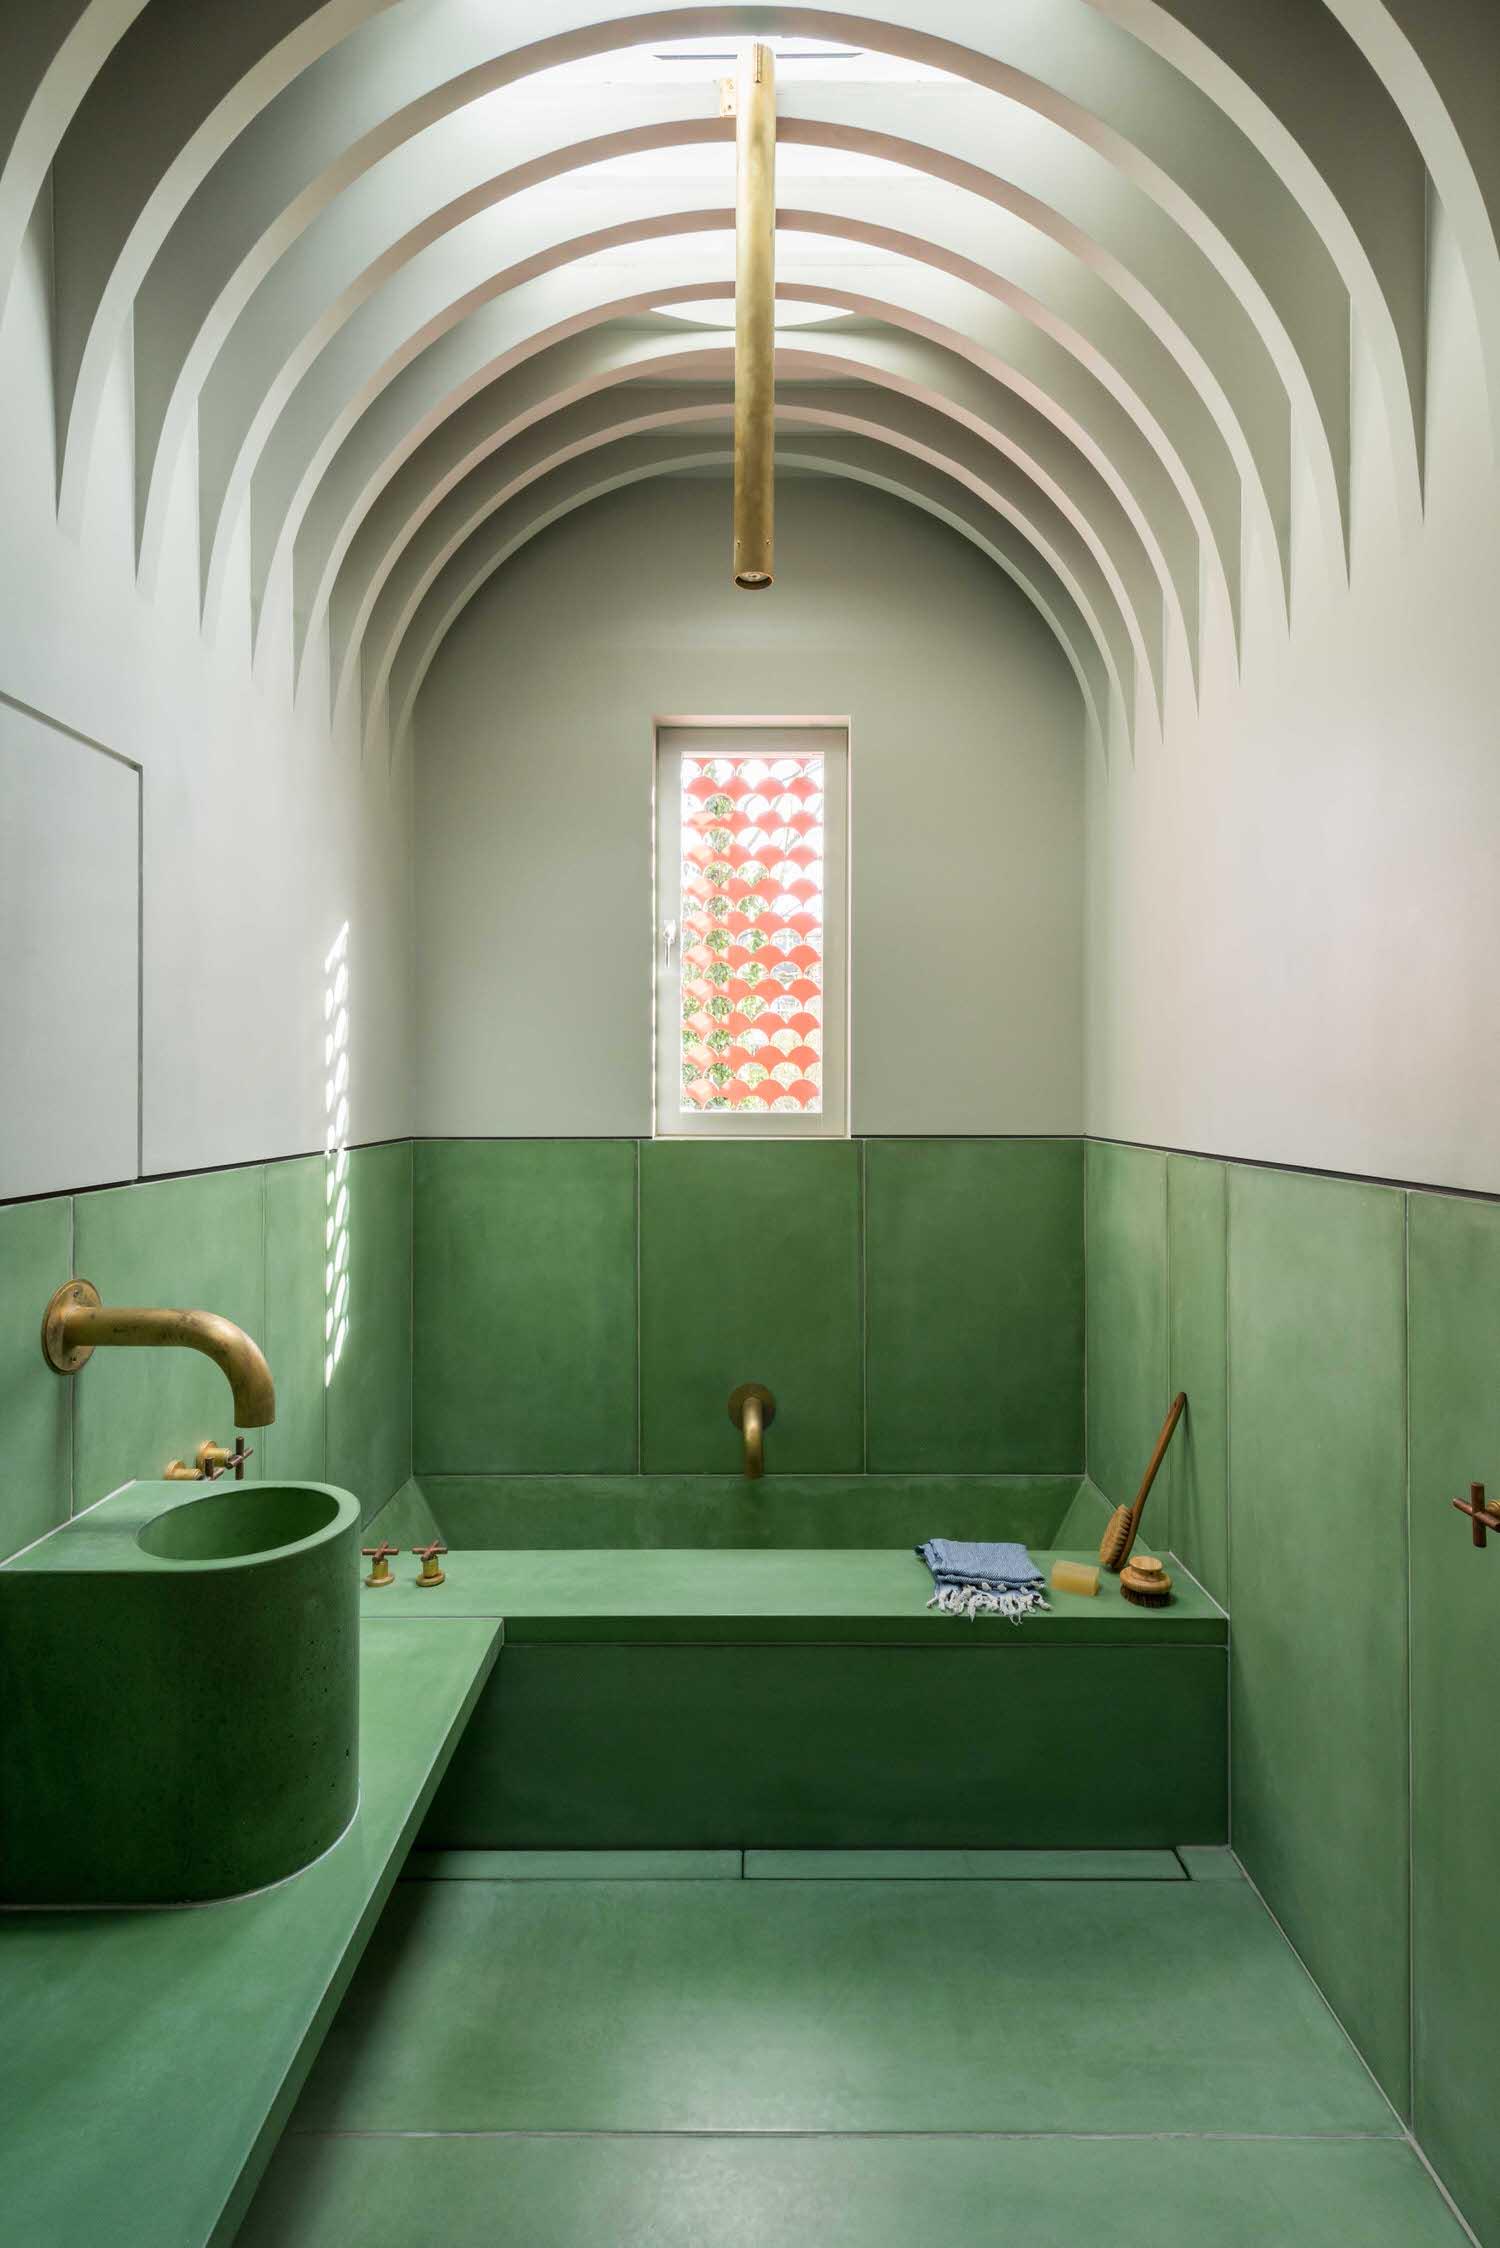 Studio Ben Allen House Recast London Residential Architecture Photo French+tye Yellowtrace 25